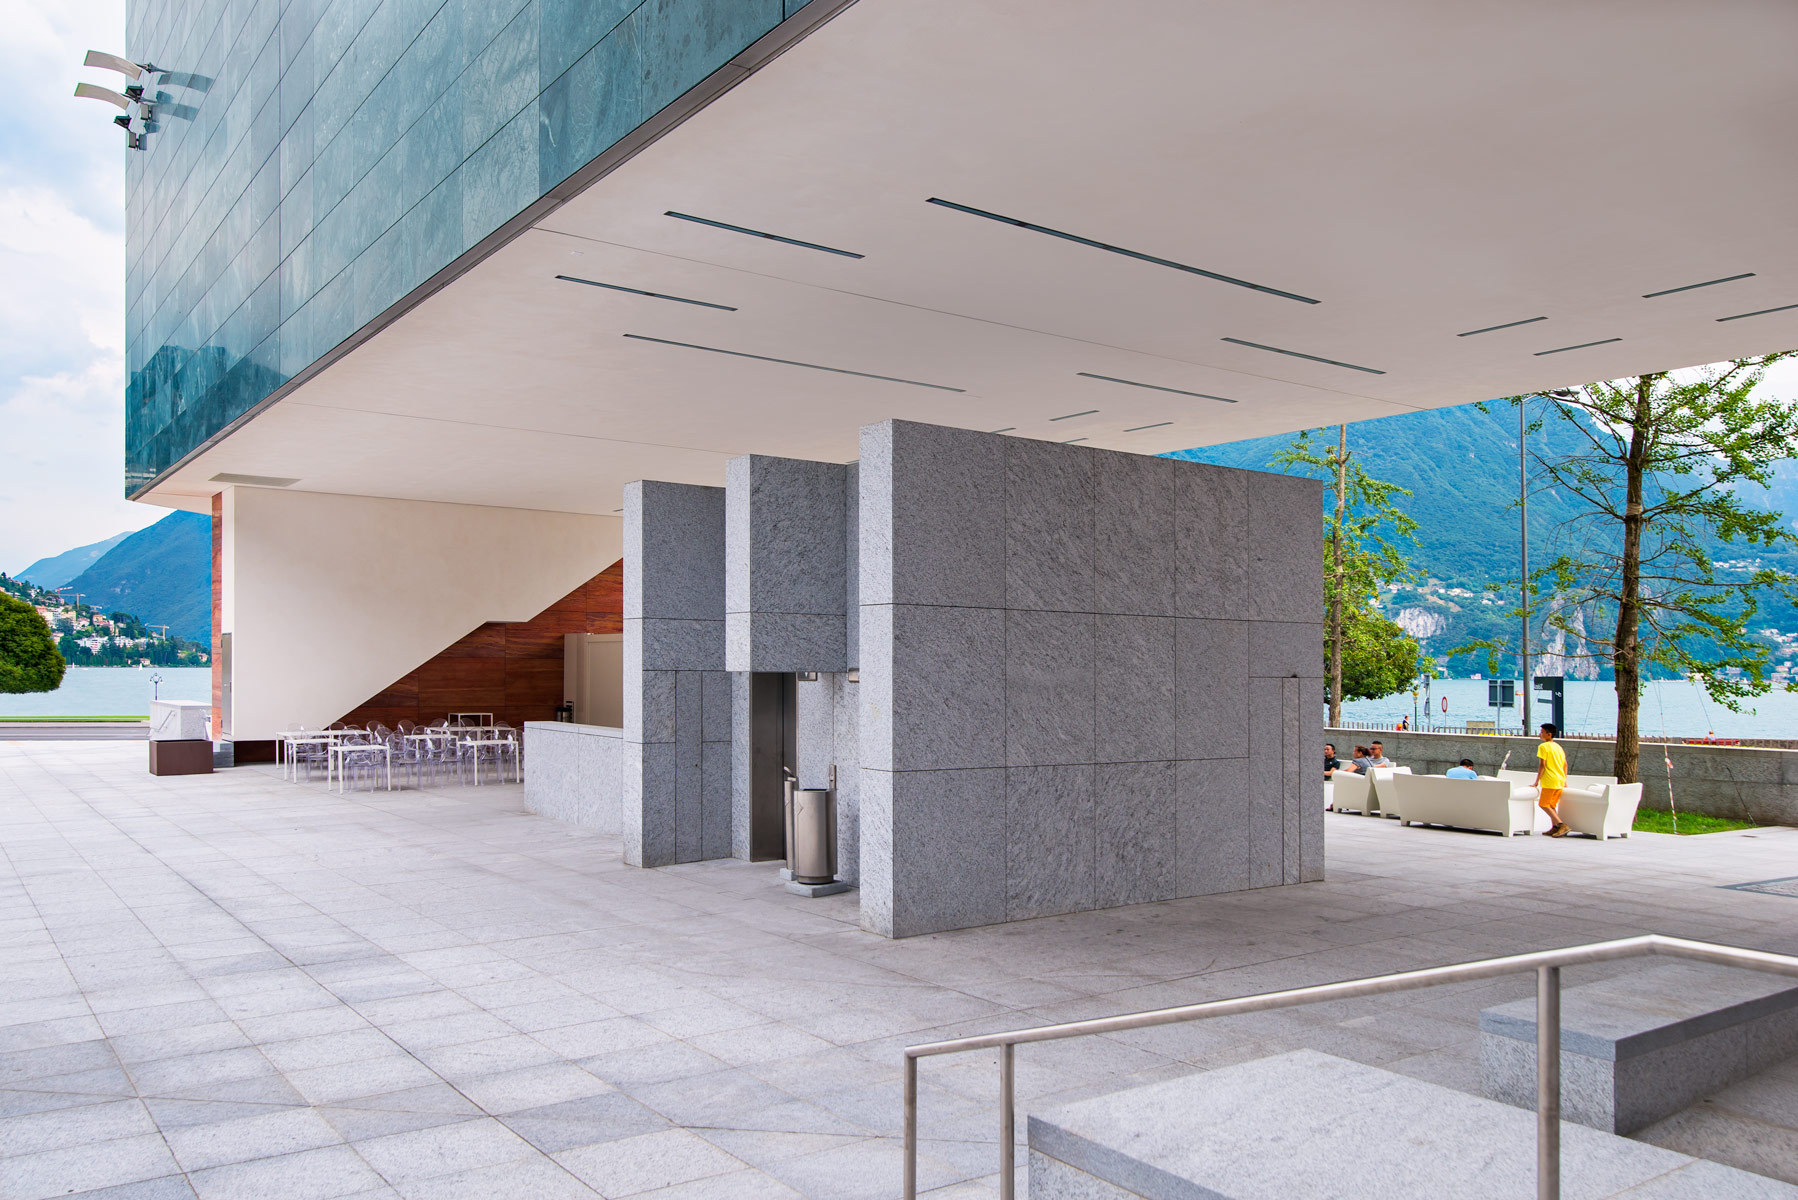 Lugano Center for Arts and CultureLugano, Switzerland